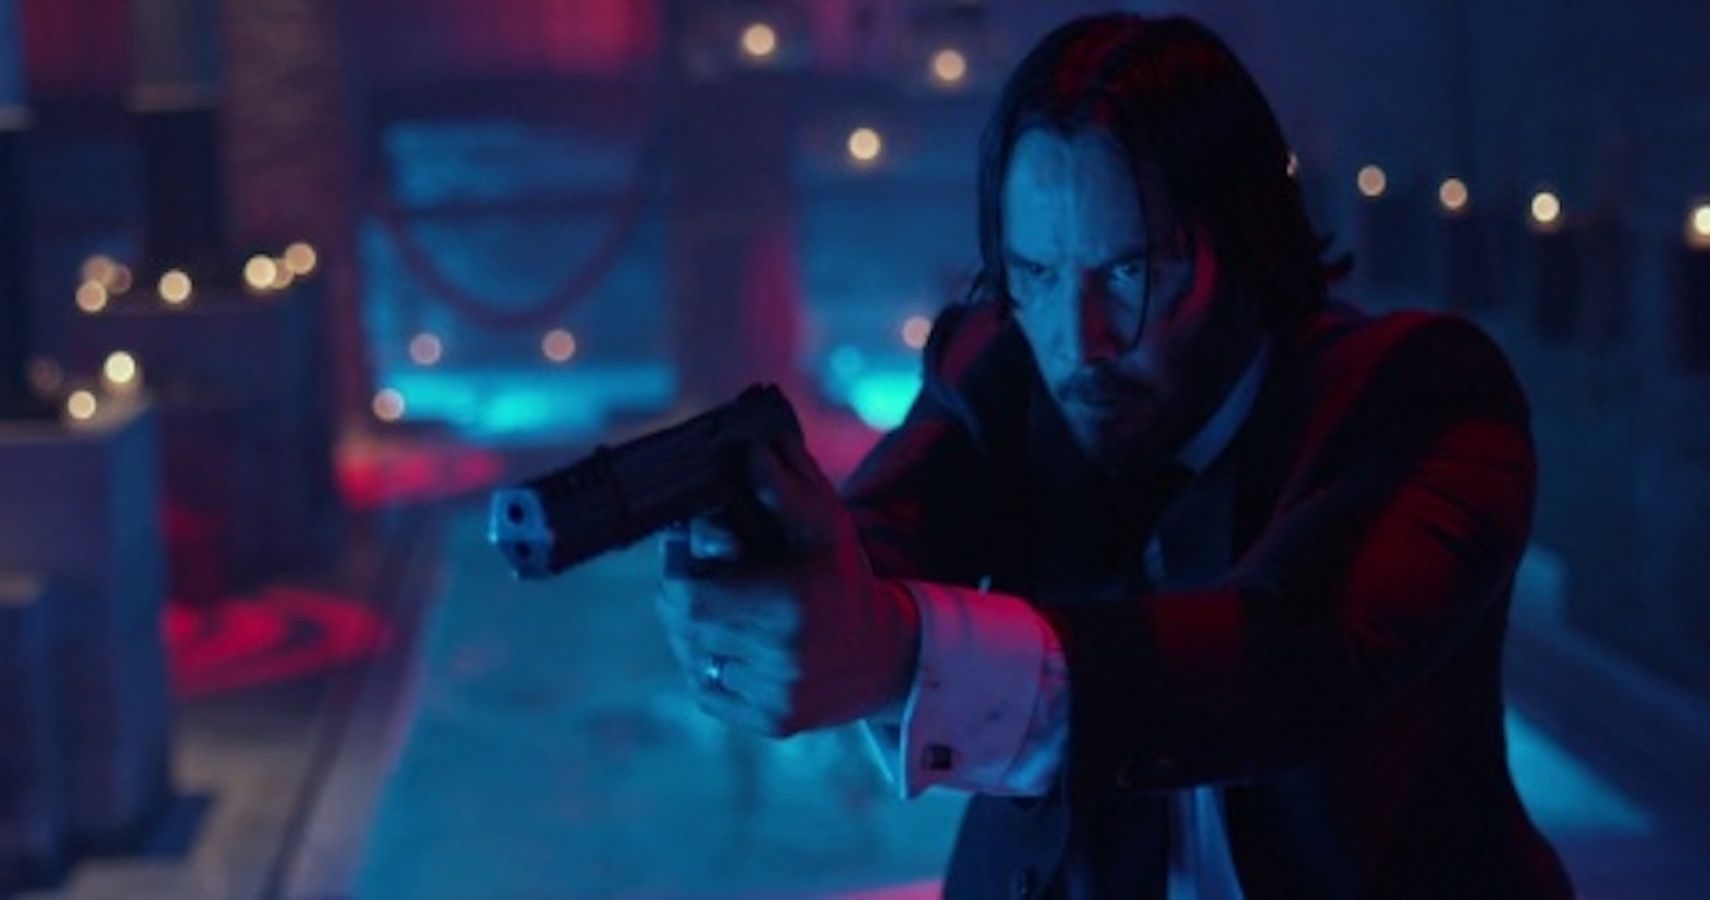 John Wick S Top 15 Weapons Ranked Screenrant